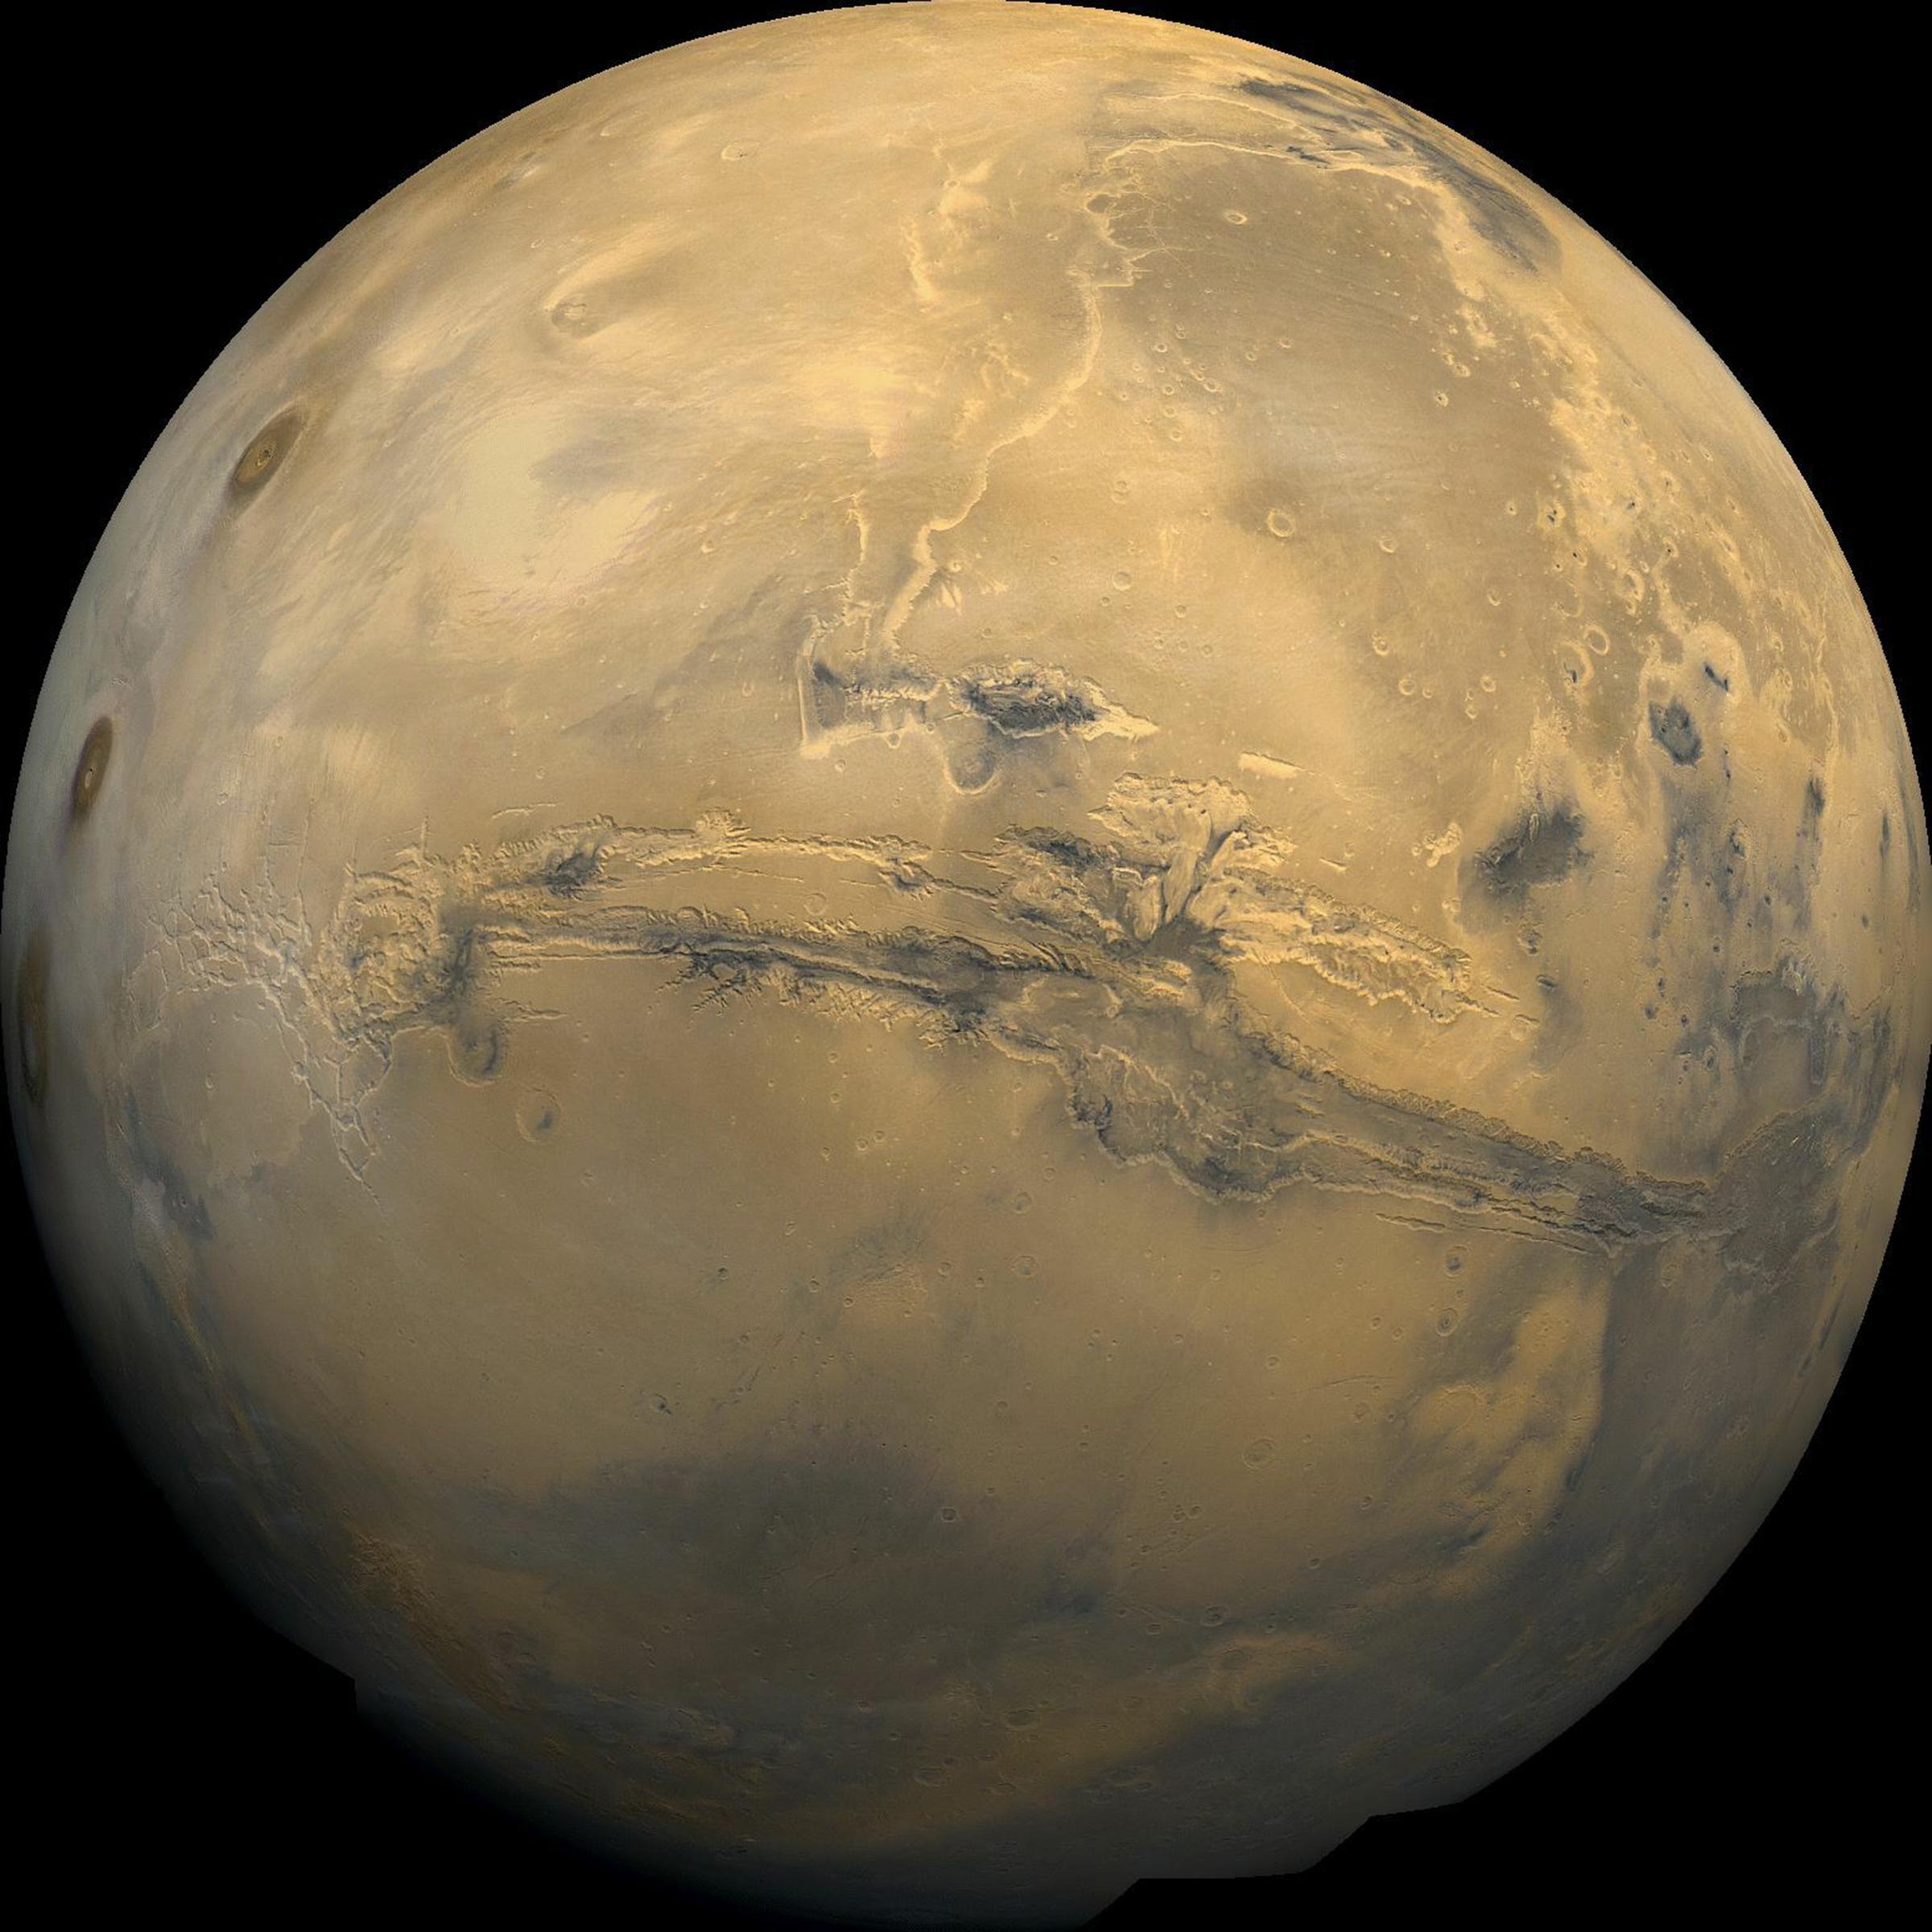 <p>An image of Mars showingthe massive canyon Valles Marineris.</p>